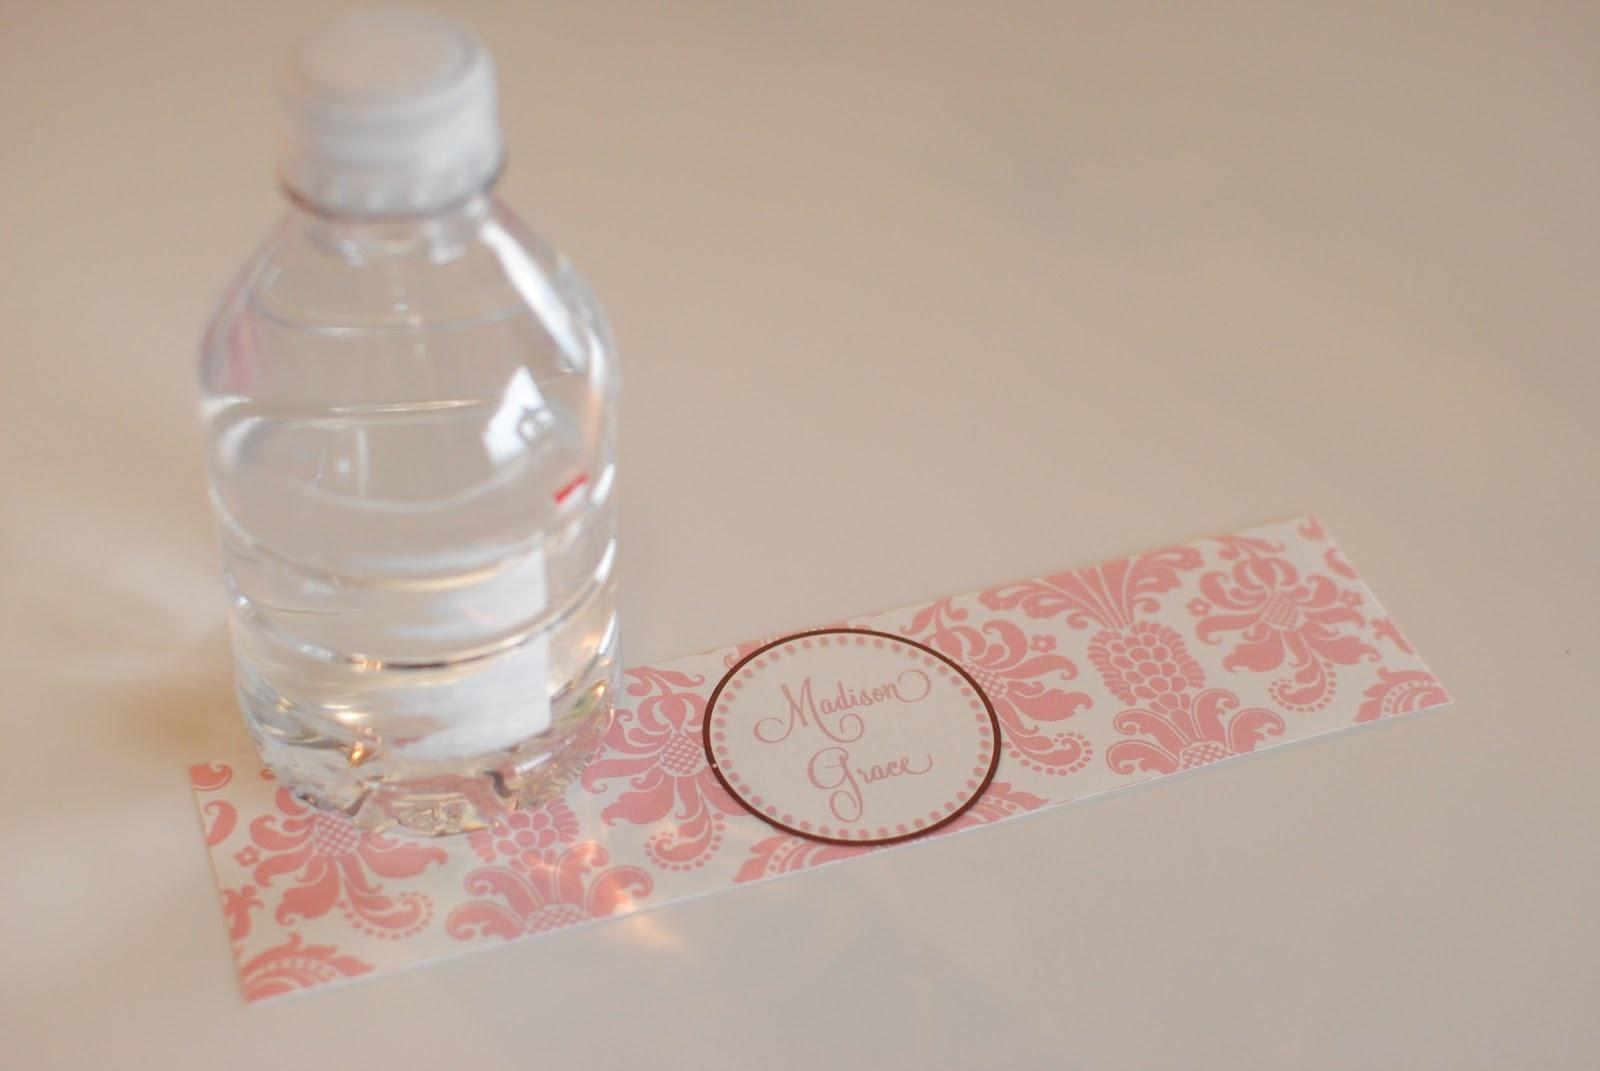 Life {Sweet} Life: Diy Printable Water Bottle Labels - Free Printable Baby Shower Labels For Bottled Water